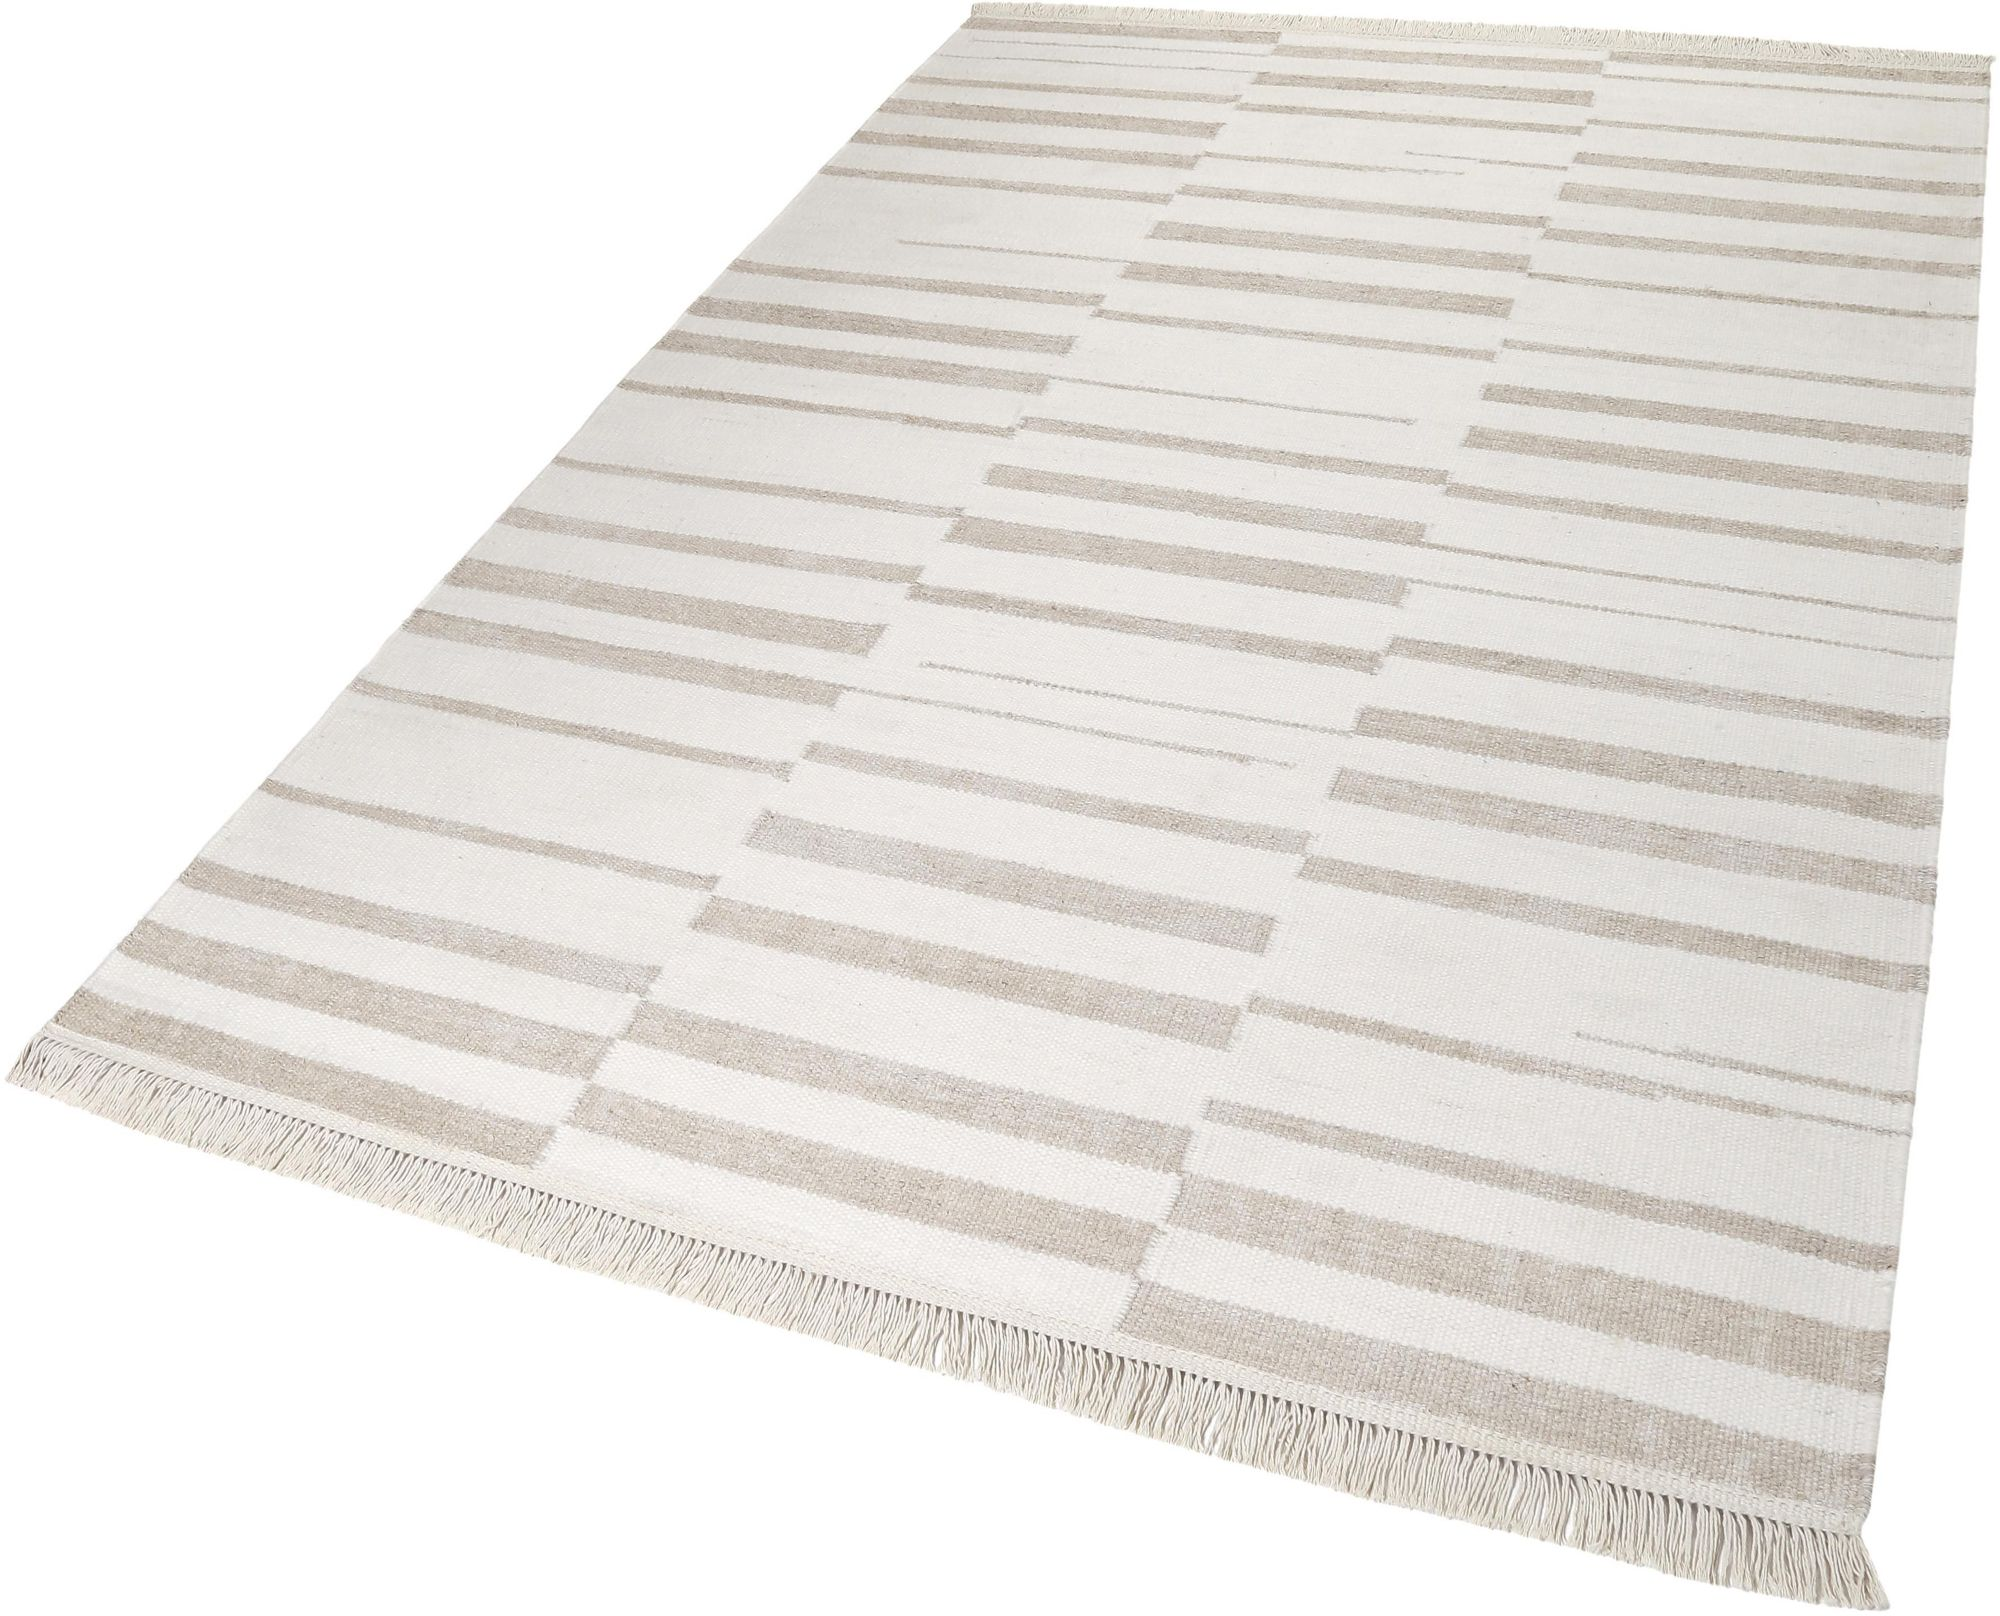 CARPETSCO Teppich, Carpets&Co, »Skid Marks«, Höhe: 5 mm, handgewebt